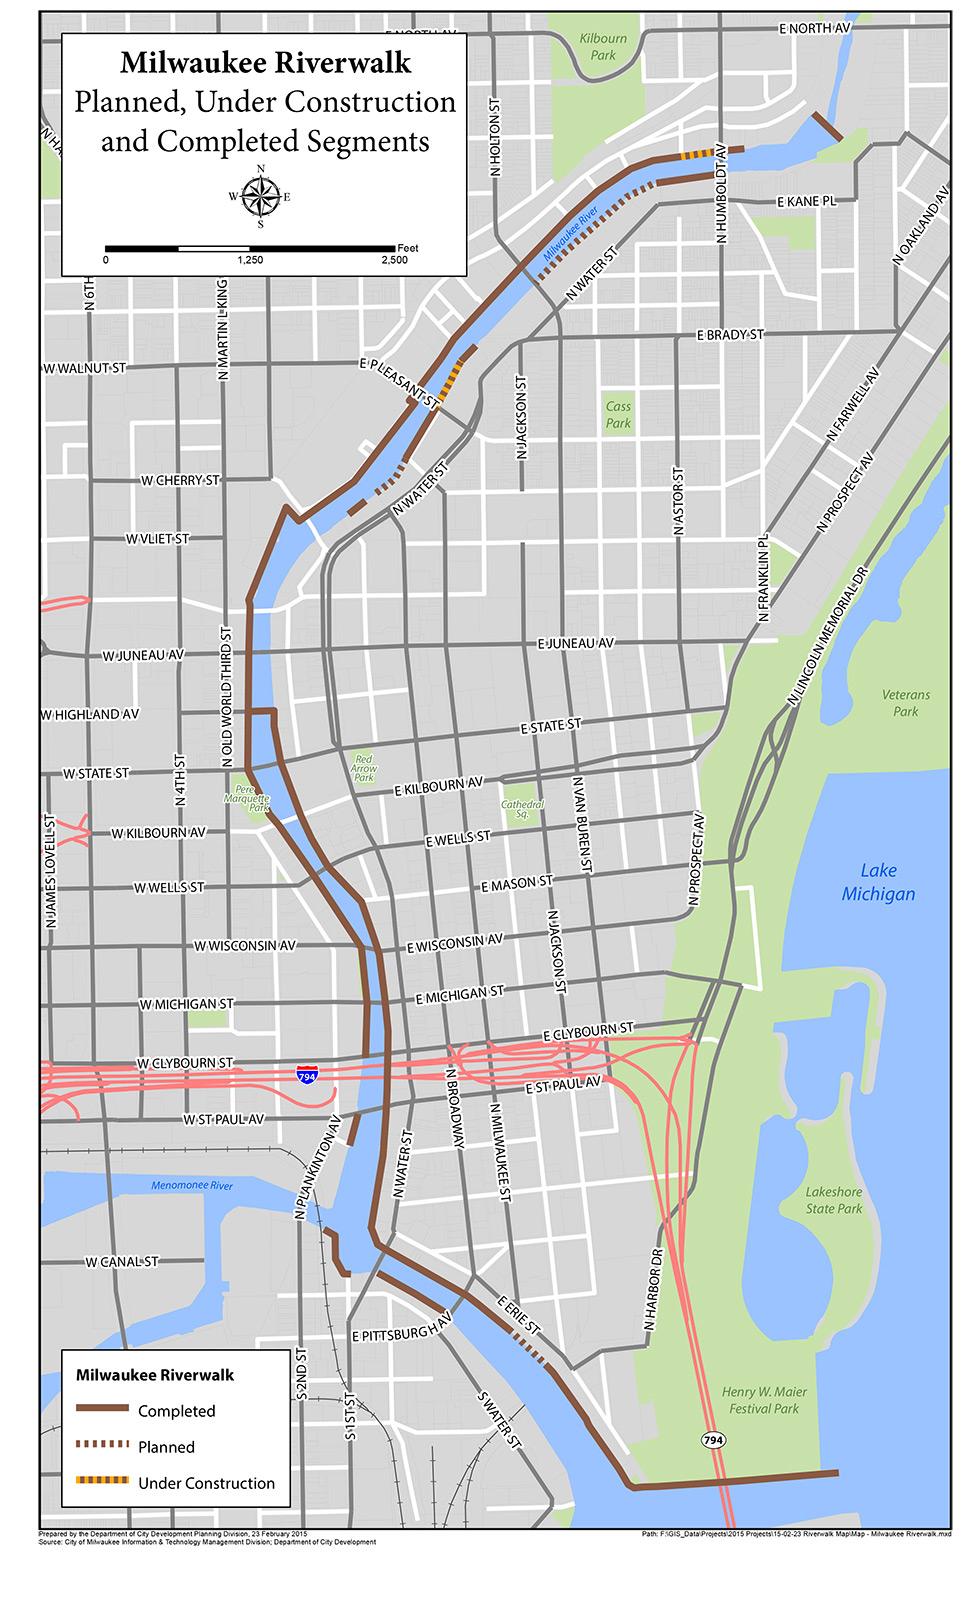 Eyes on Milwaukee 5 Ways to Improve the Riverwalk Urban Milwaukee